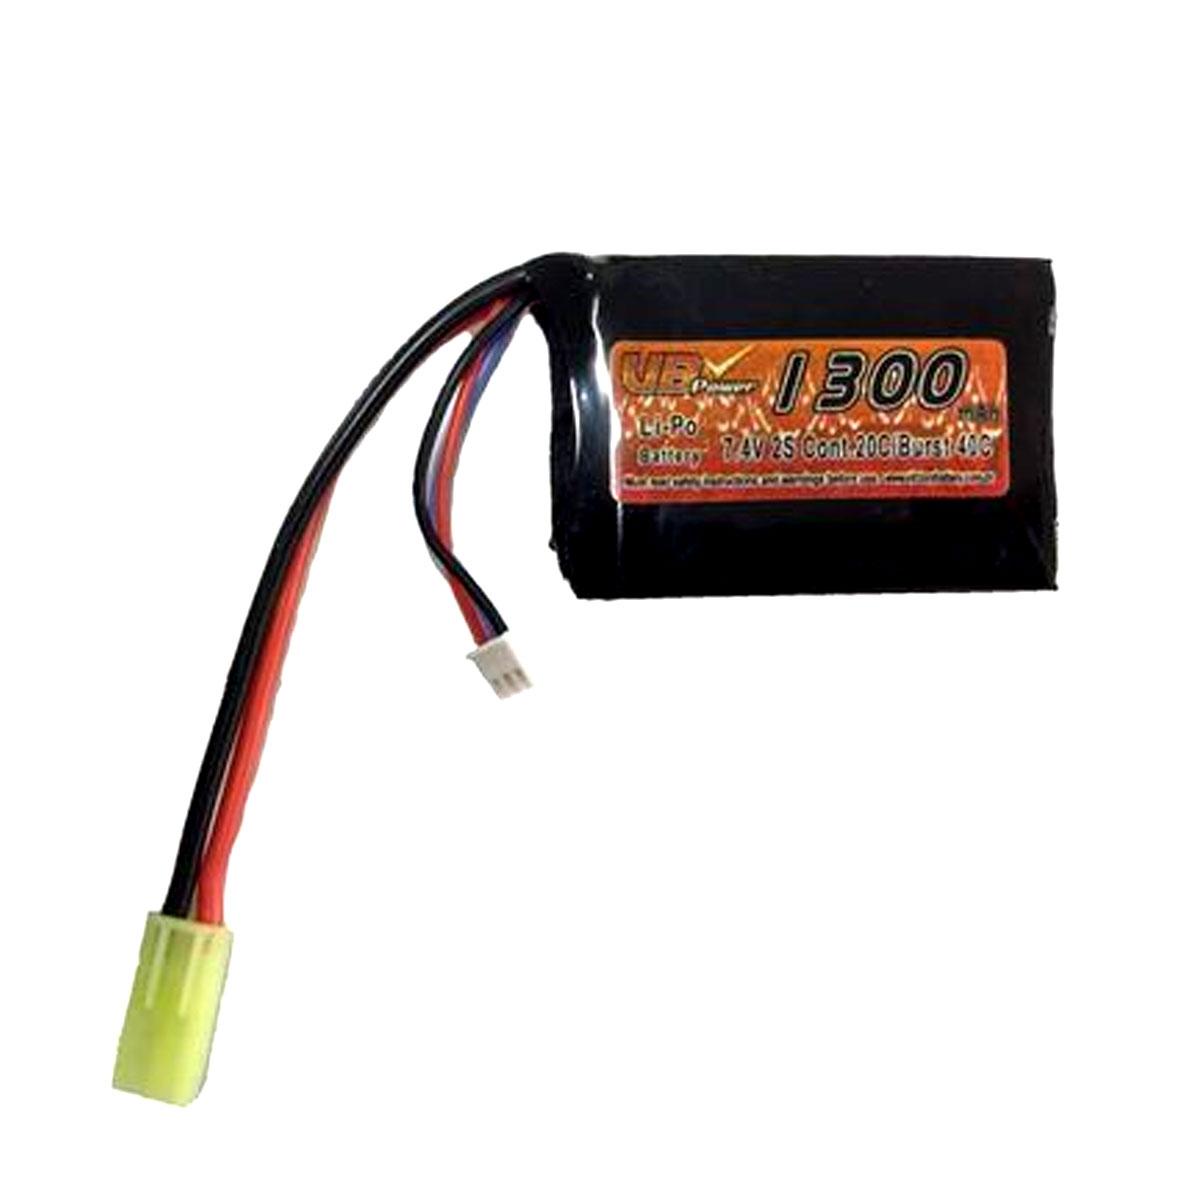 Bateria Lipo 7,4v 1300mah 20c Medidas 14,5x42x65mm